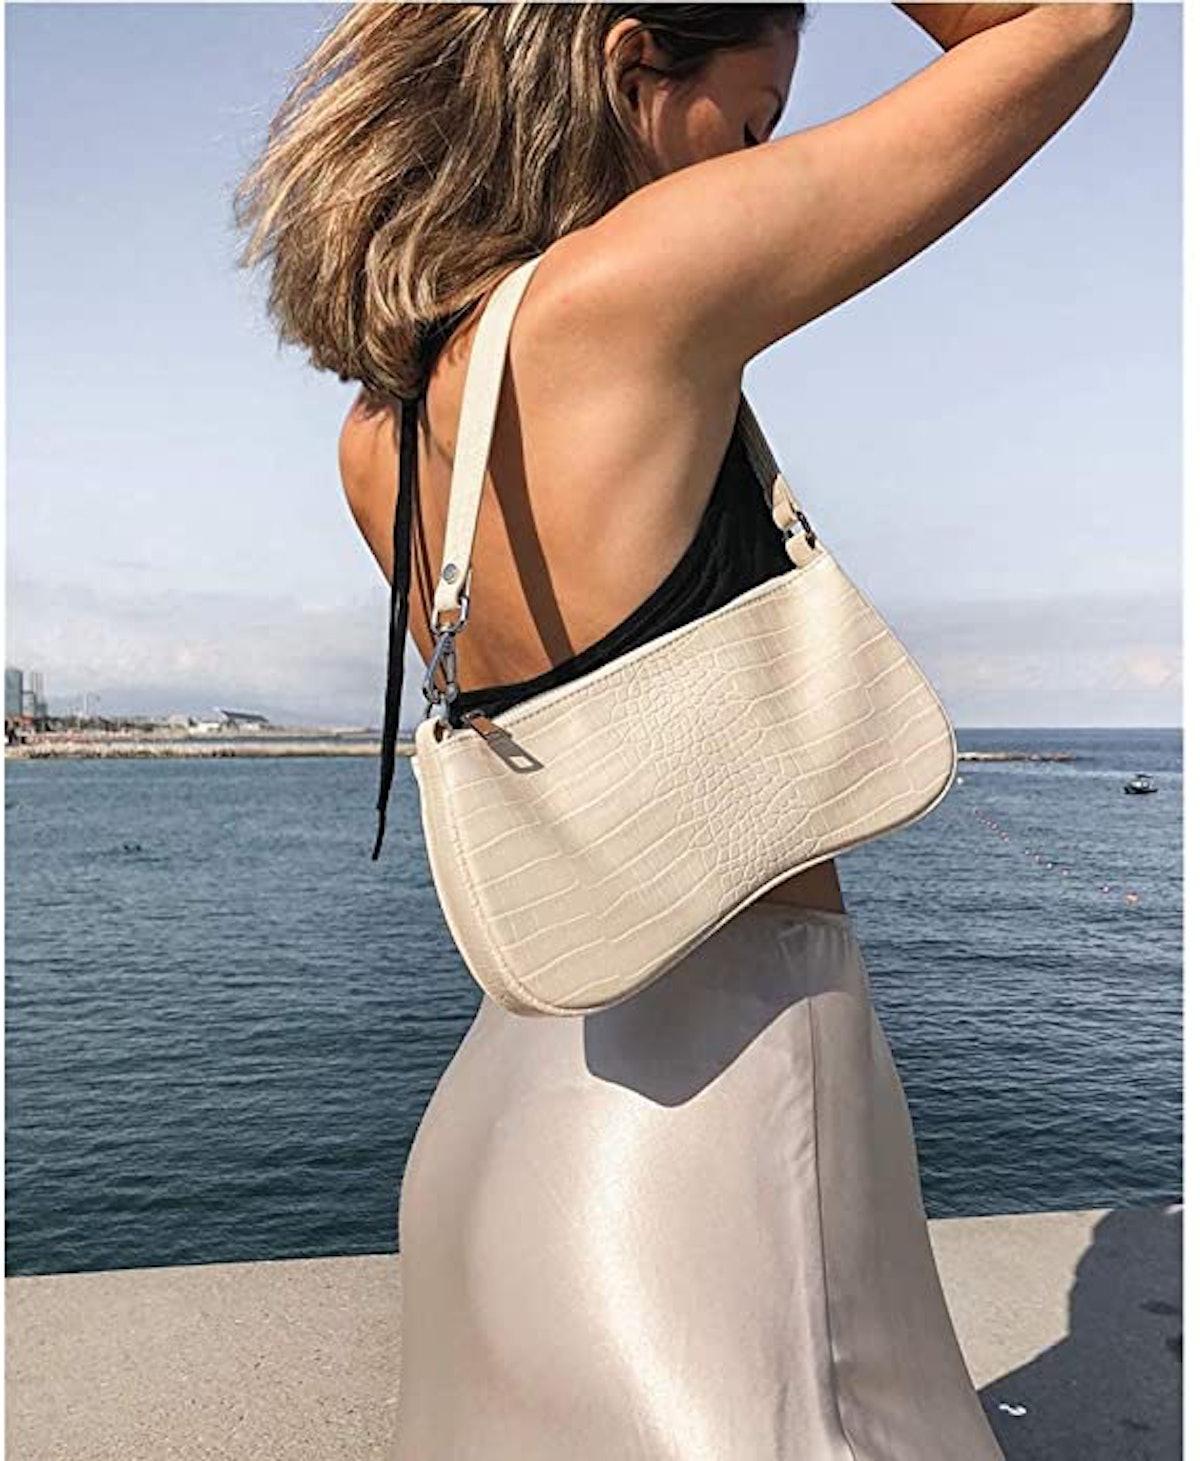 JW PEI 90s Shoulder Bag